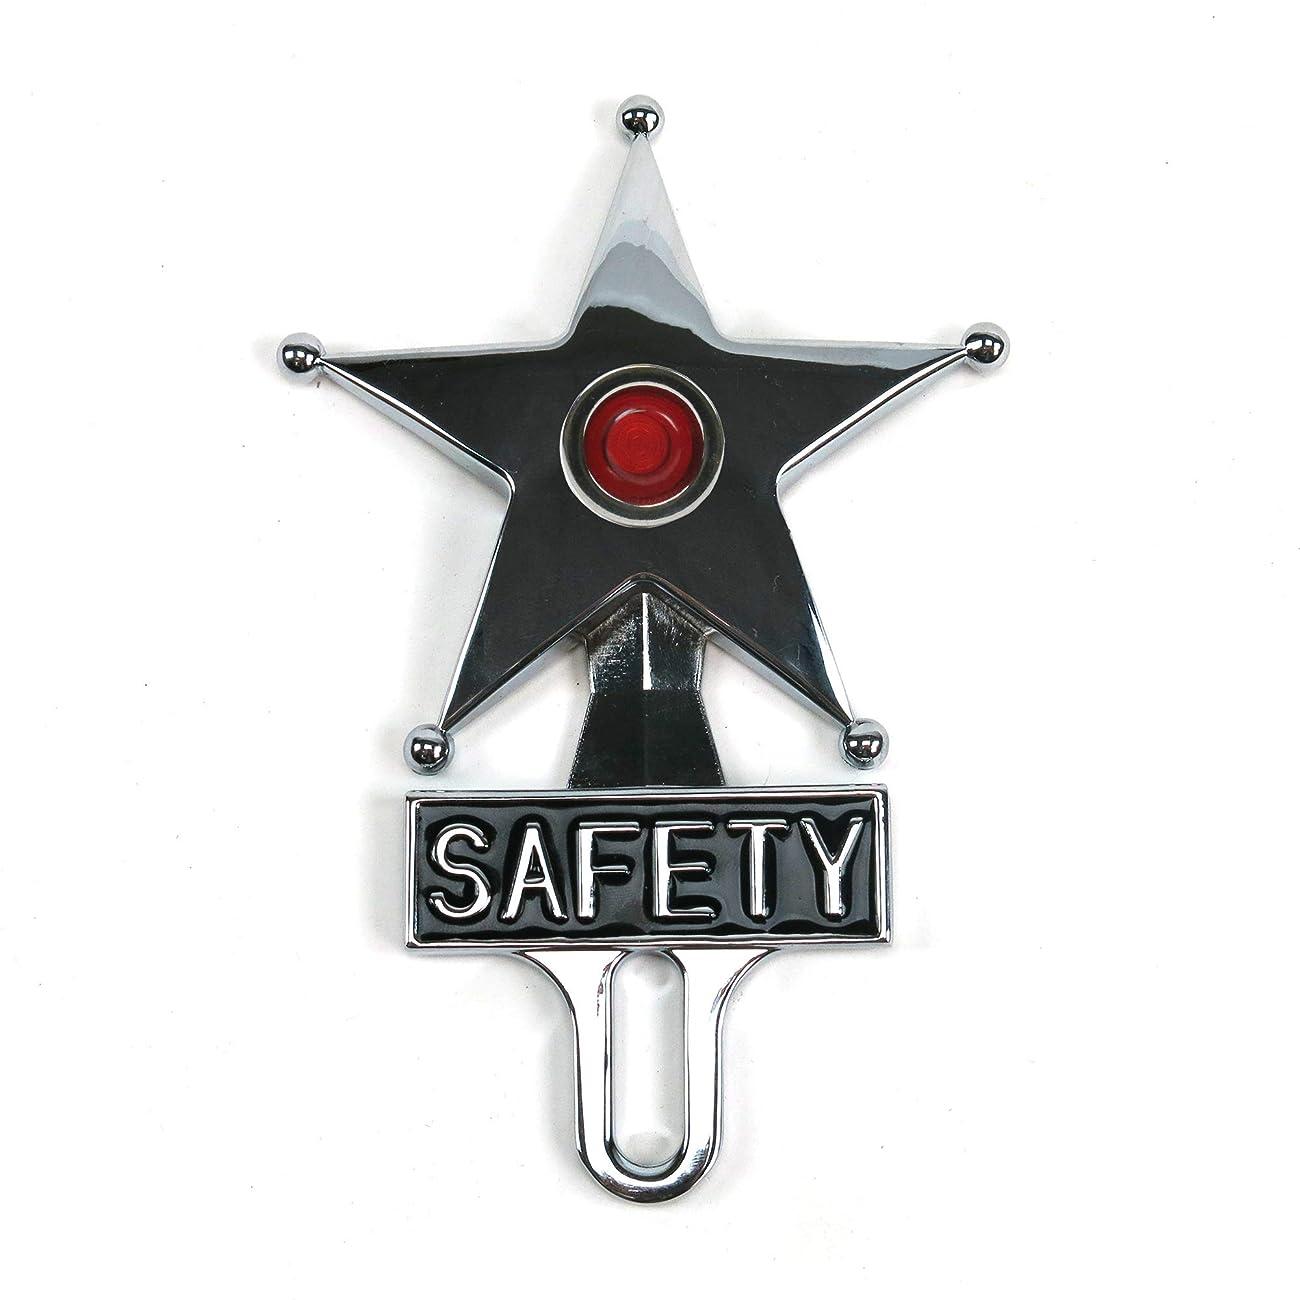 Vintage Parts 701964 Chromed License Plate (Topper Red LED Illumination, Hot Rod Jewel Safety Star)